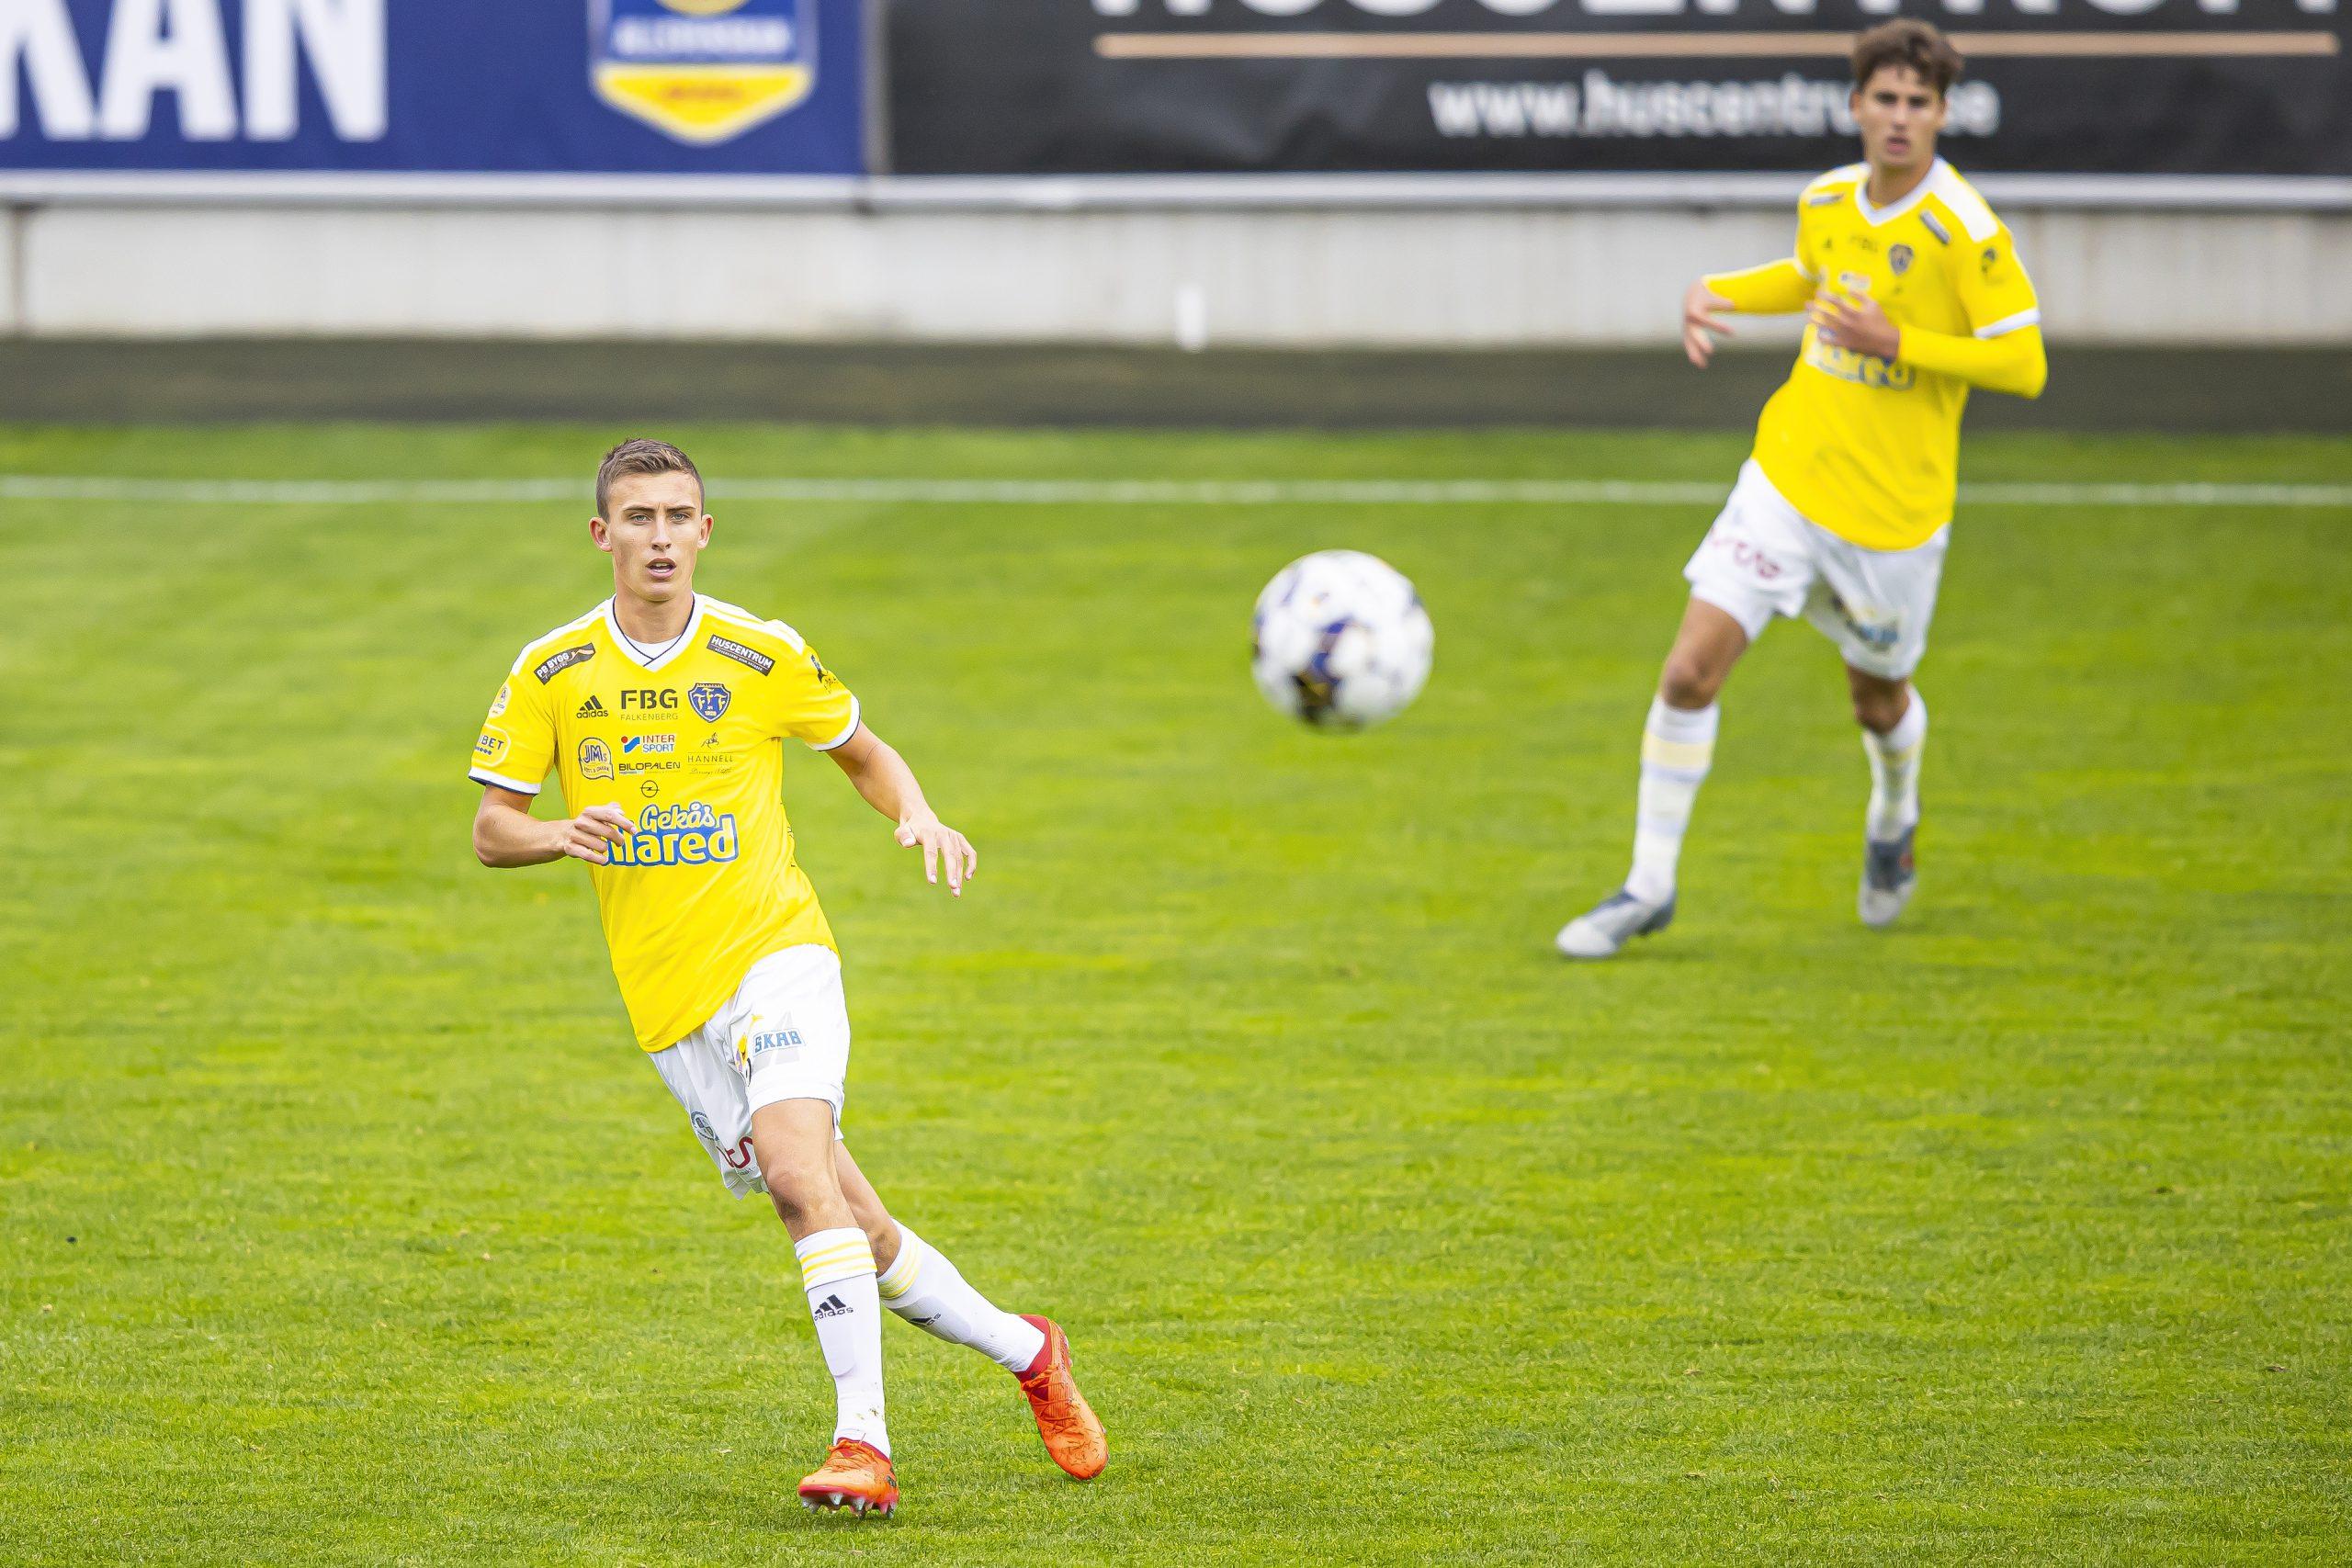 Falkenbergs FF säljer John Björkengren till Lecce